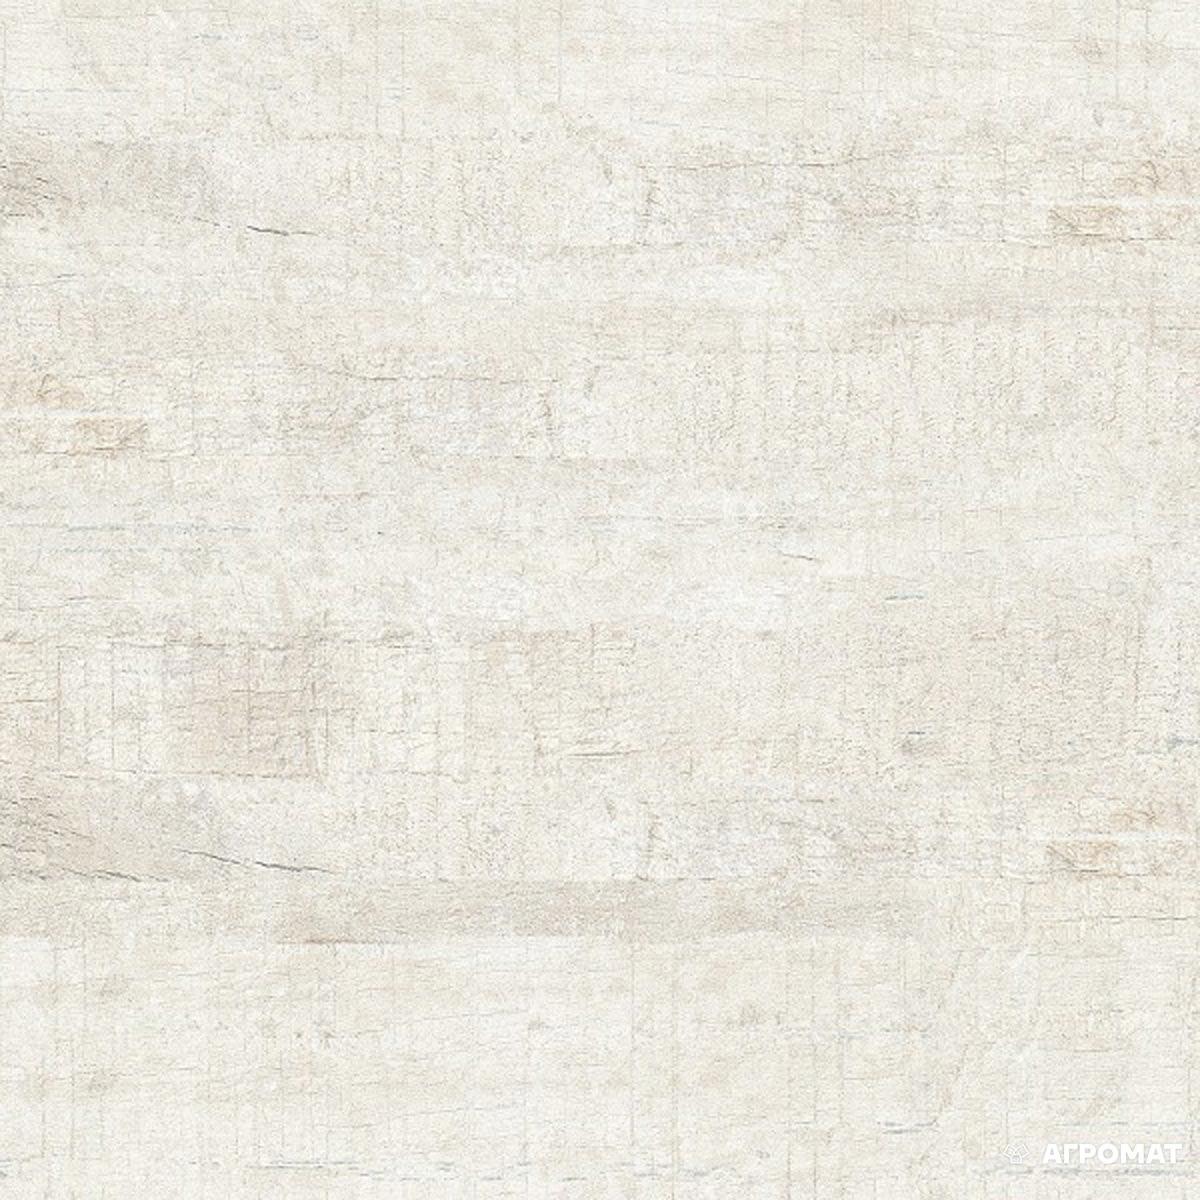 Напольная плитка Берёзакерамика Корсика КОРСИКА G натурал арт.(392373)